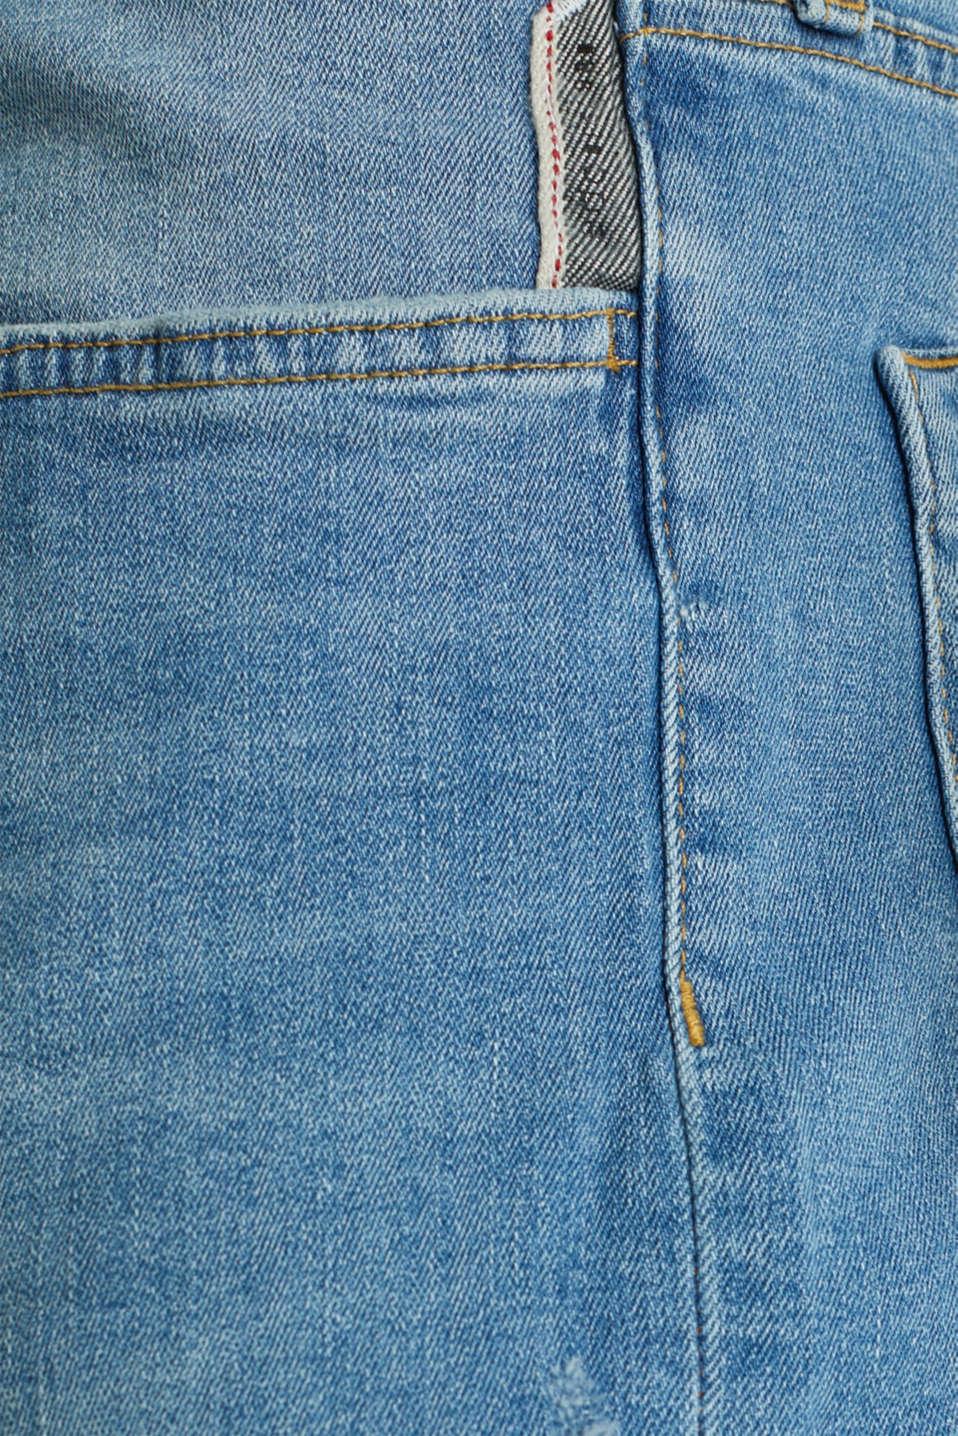 Stretch jeans in a basic design, BLUE LIGHT WASH, detail image number 4